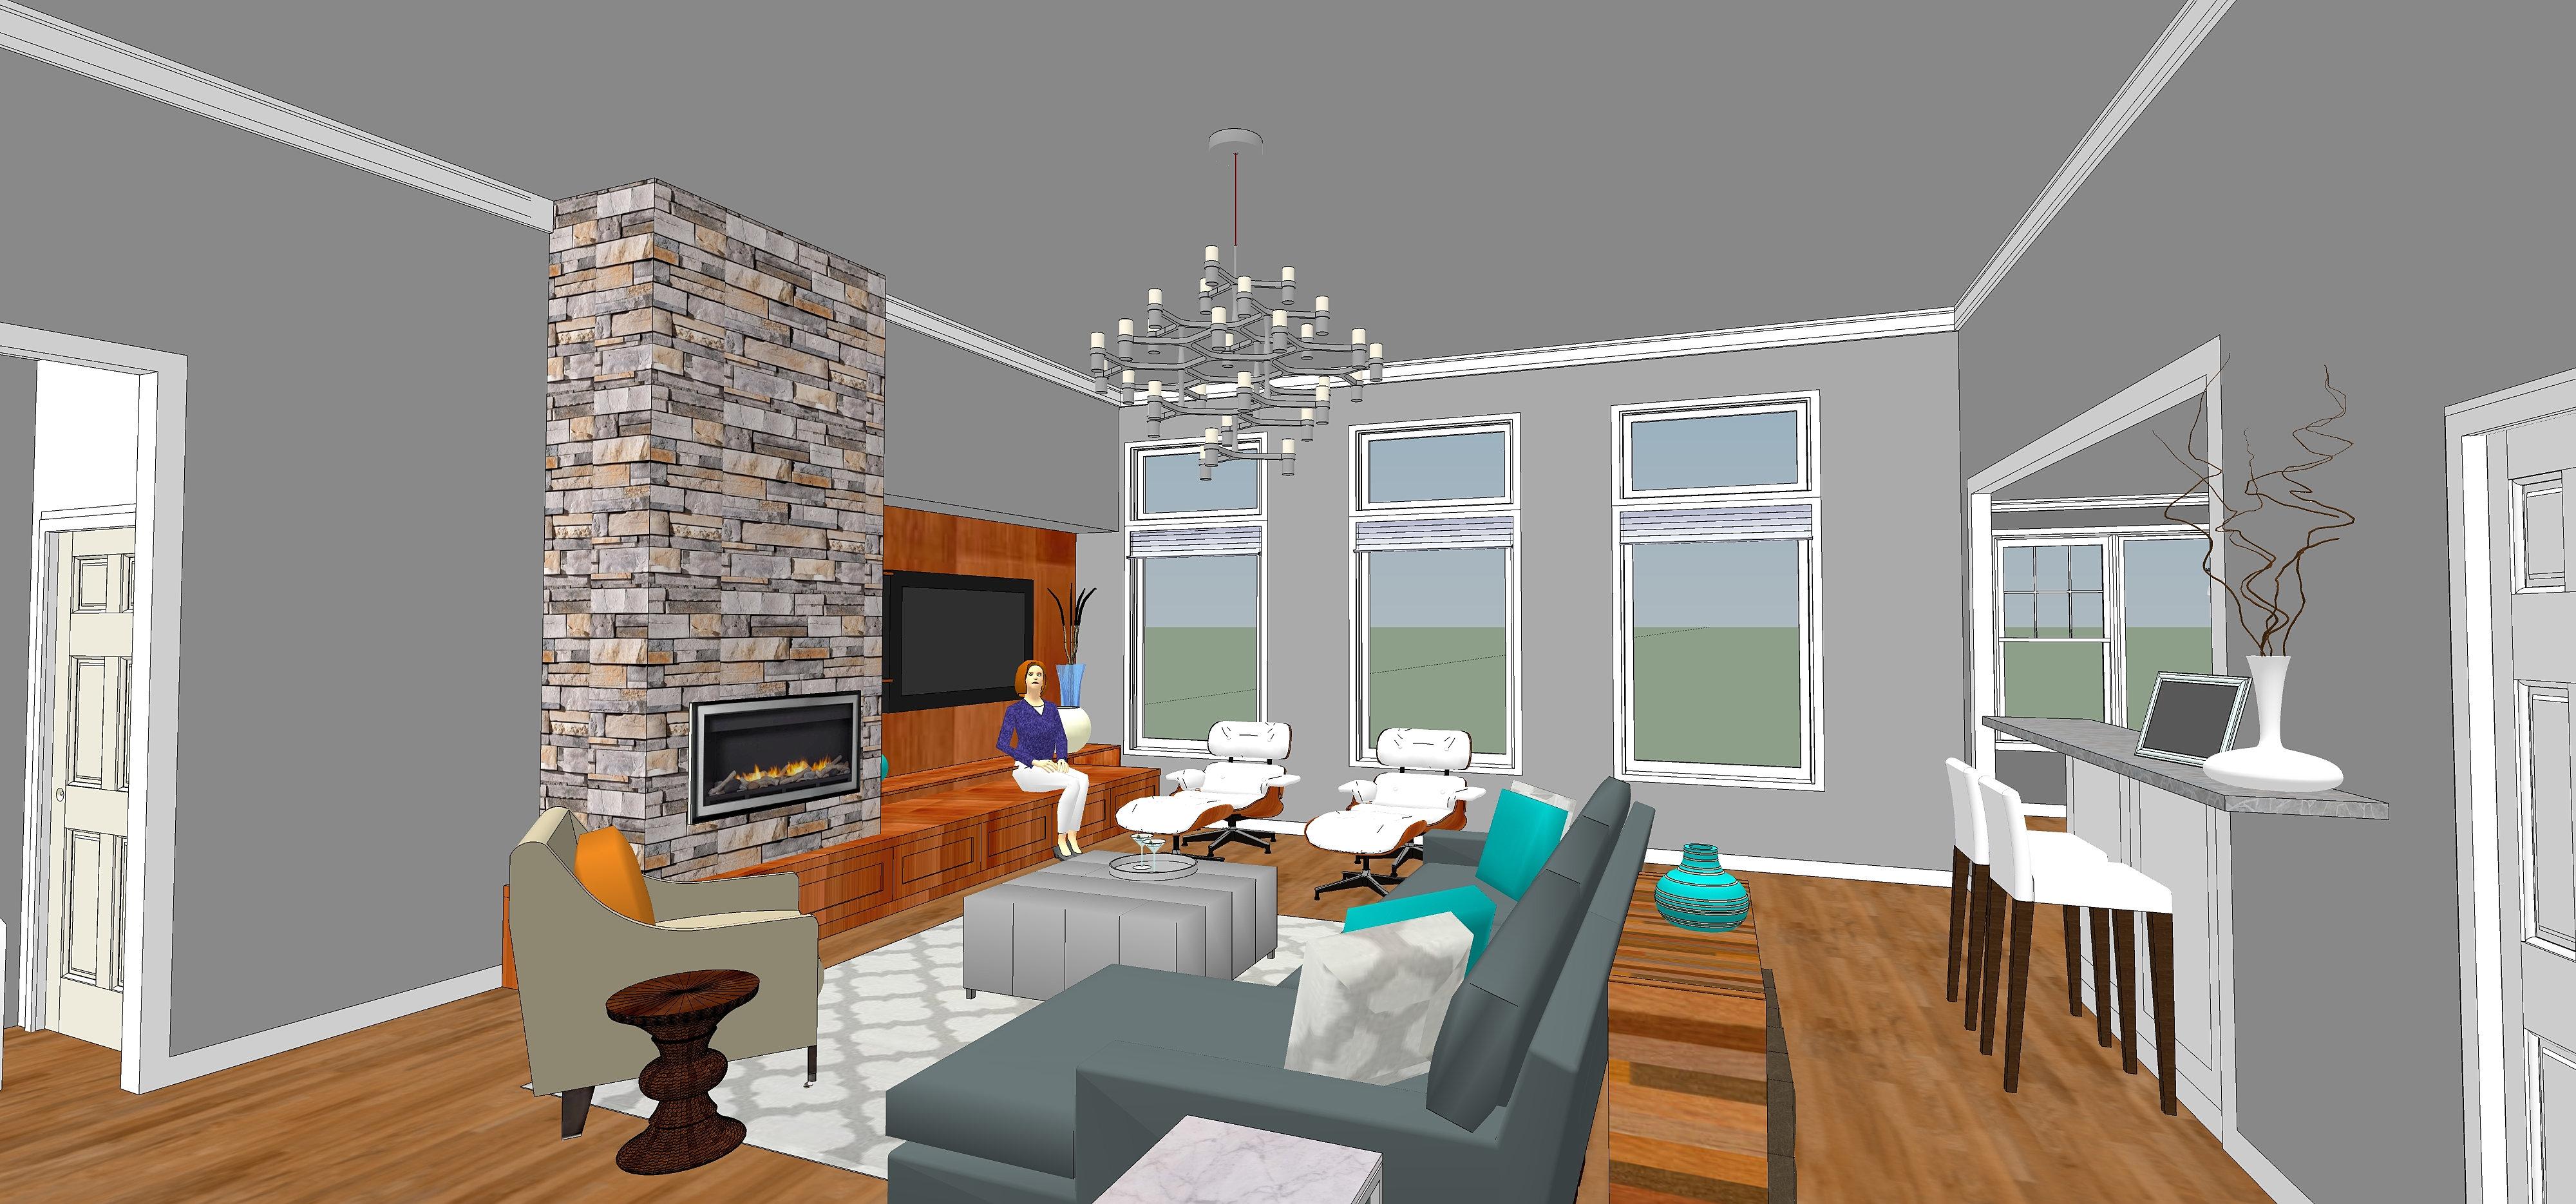 va room homes designers rva in living tribeca new rendering richmond i dob interior